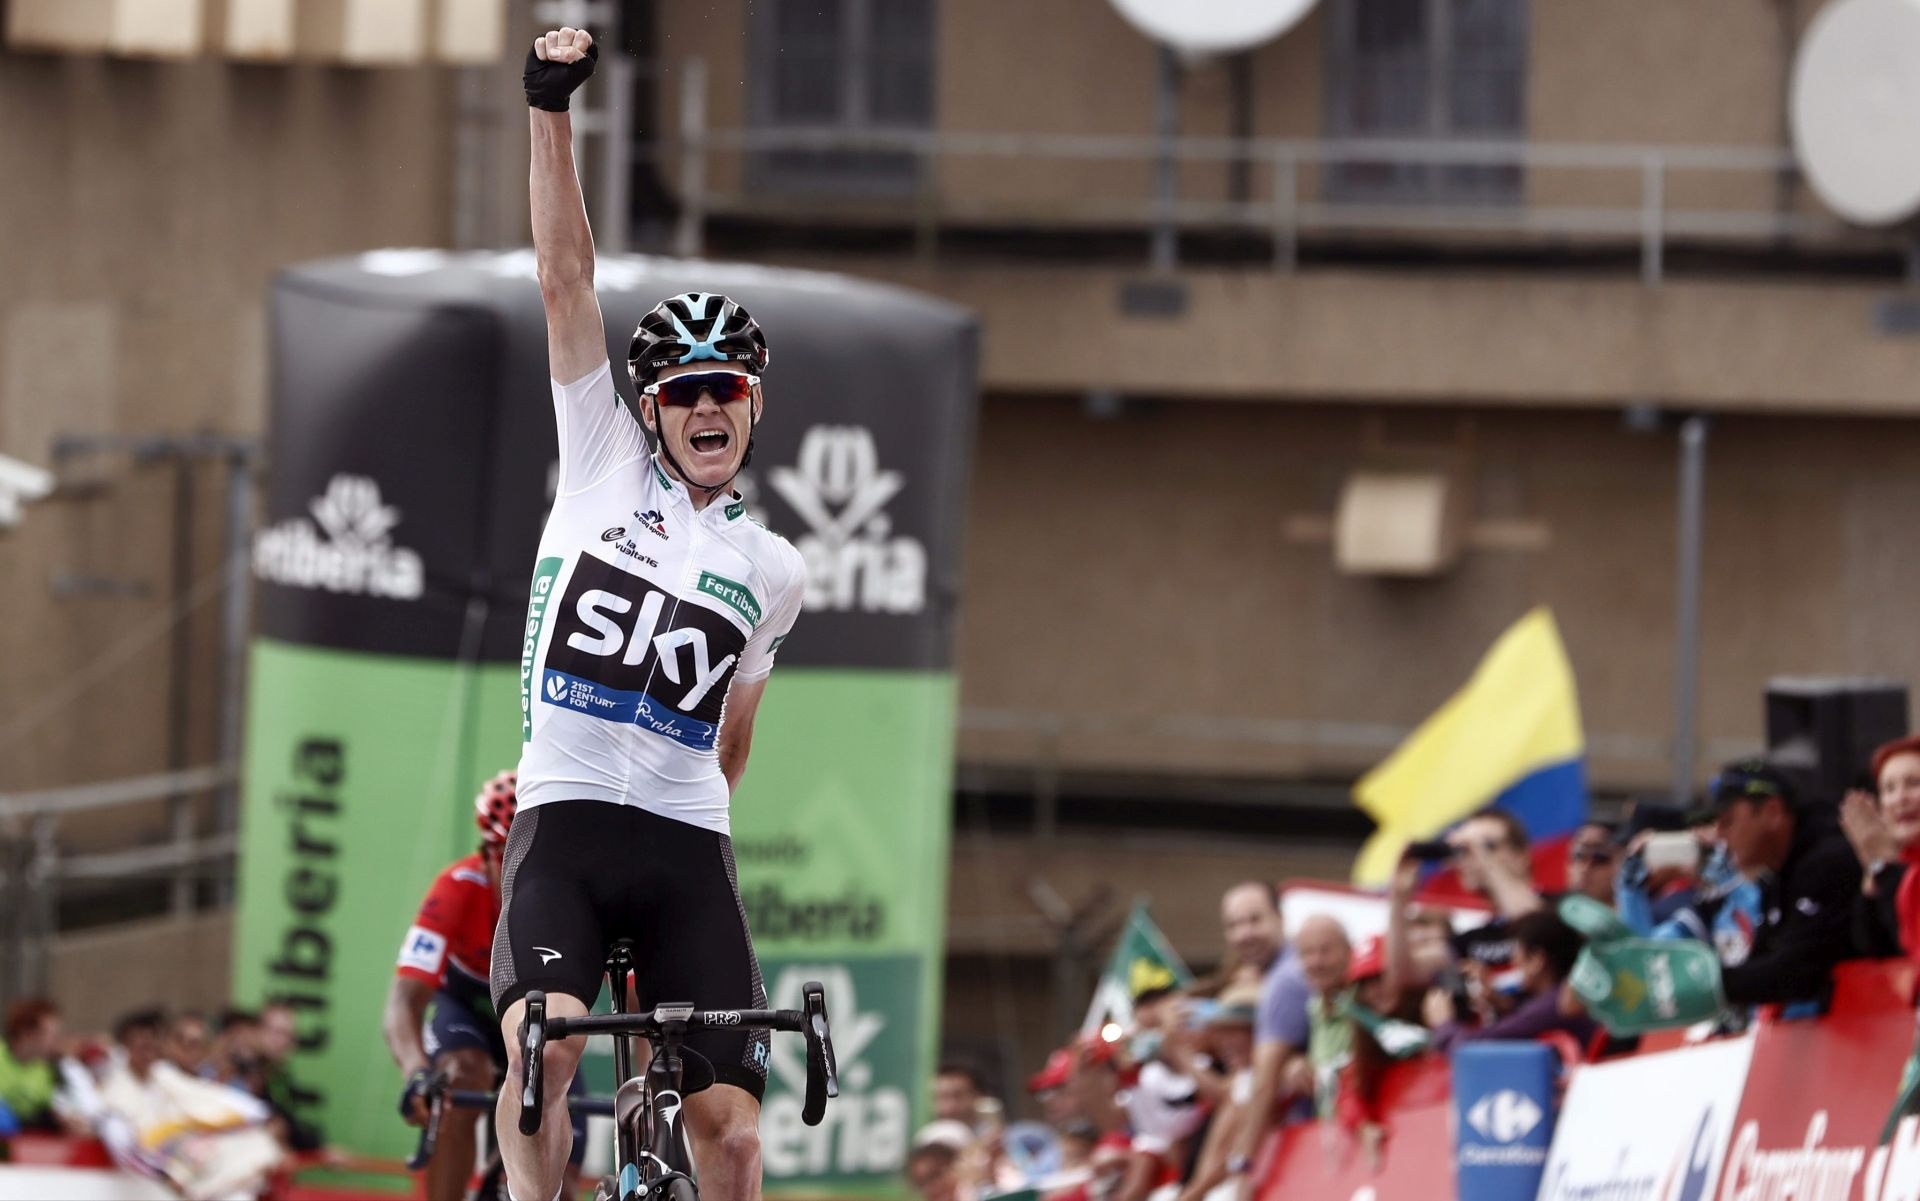 Froome pao na doping testu zbog lijeka za astmu